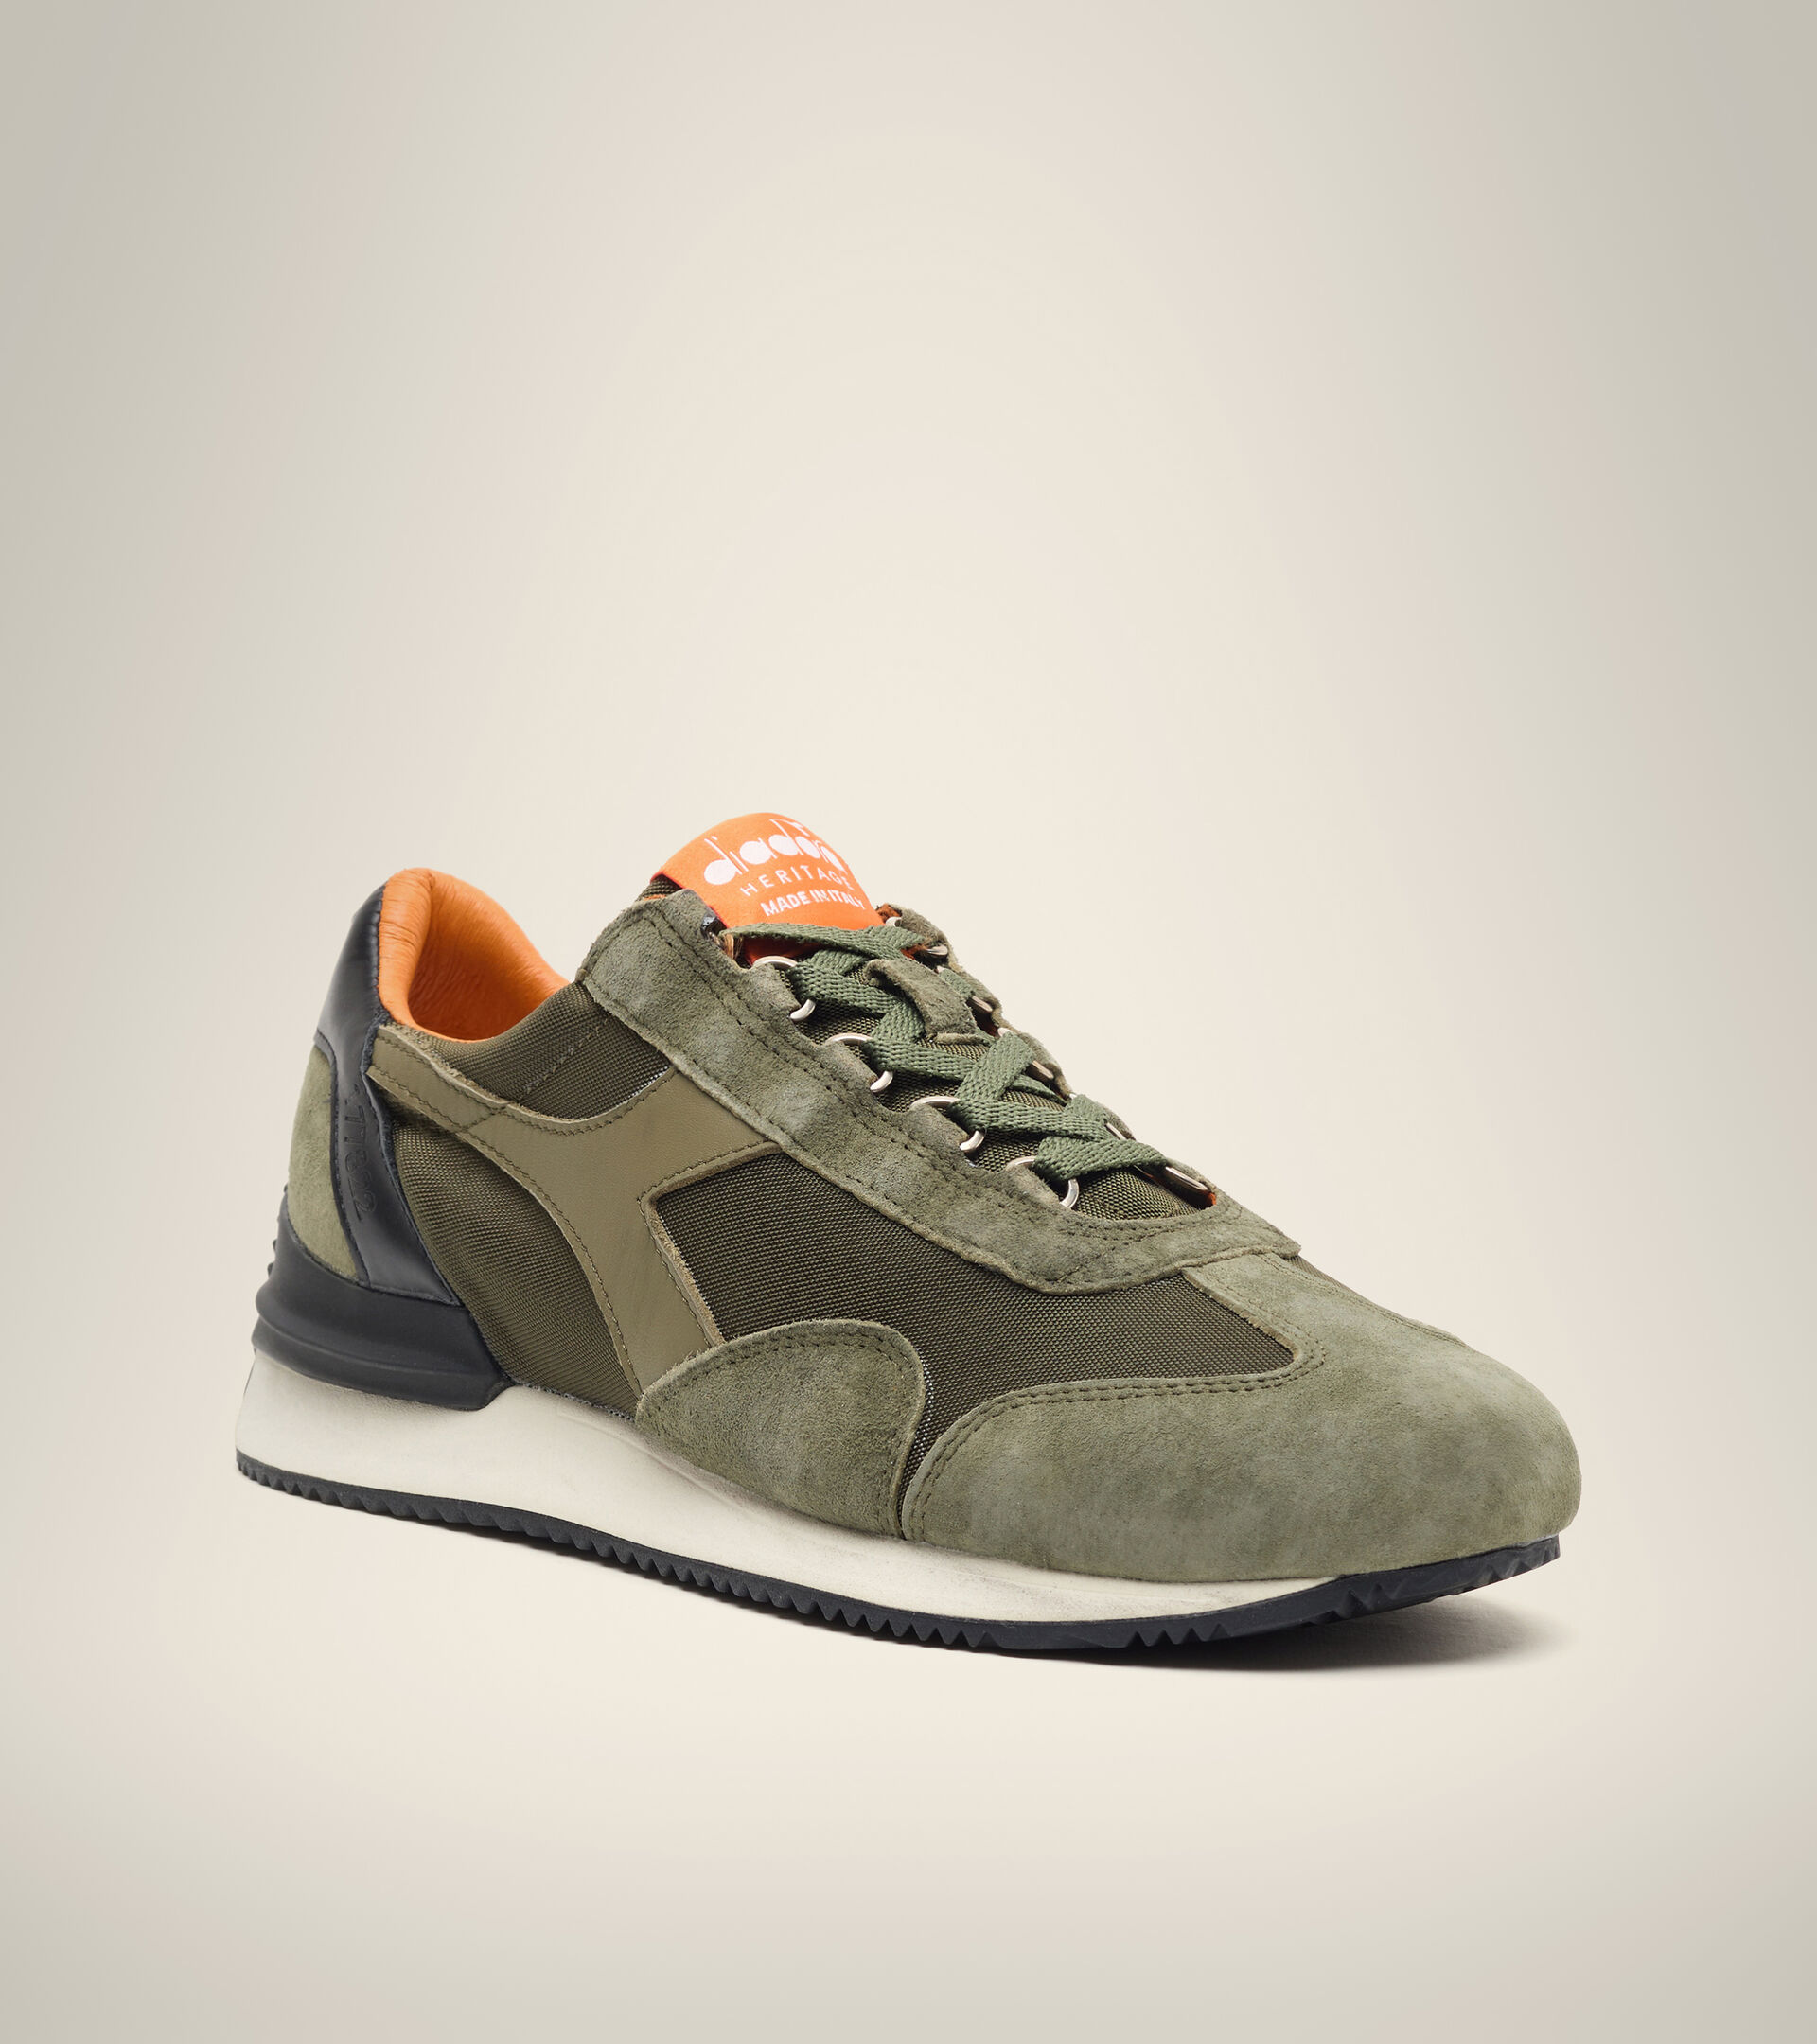 Heritage shoe - Unisex EQUIPE MAD ITALIA NUBUCK SW GREEN OLIVINE - Diadora